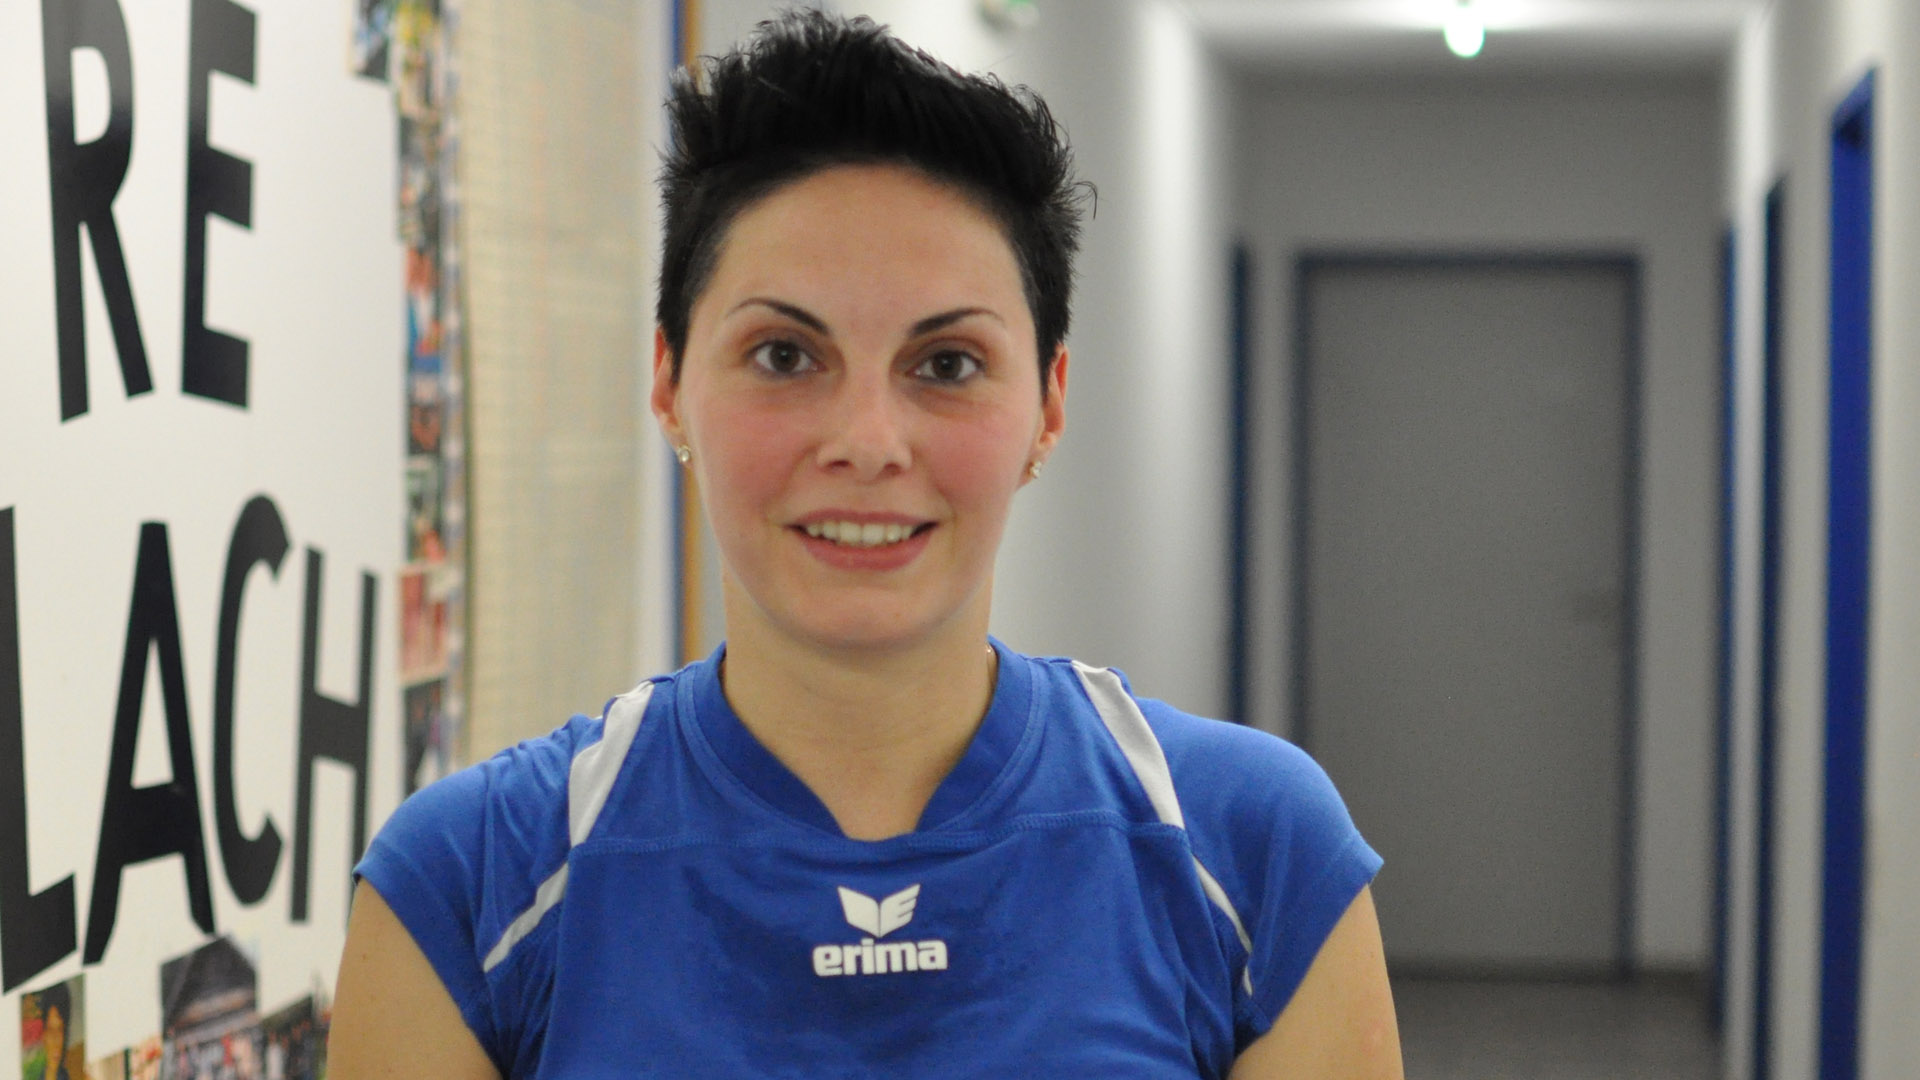 neue Bahnrekordhalterin MEHESZ Anita